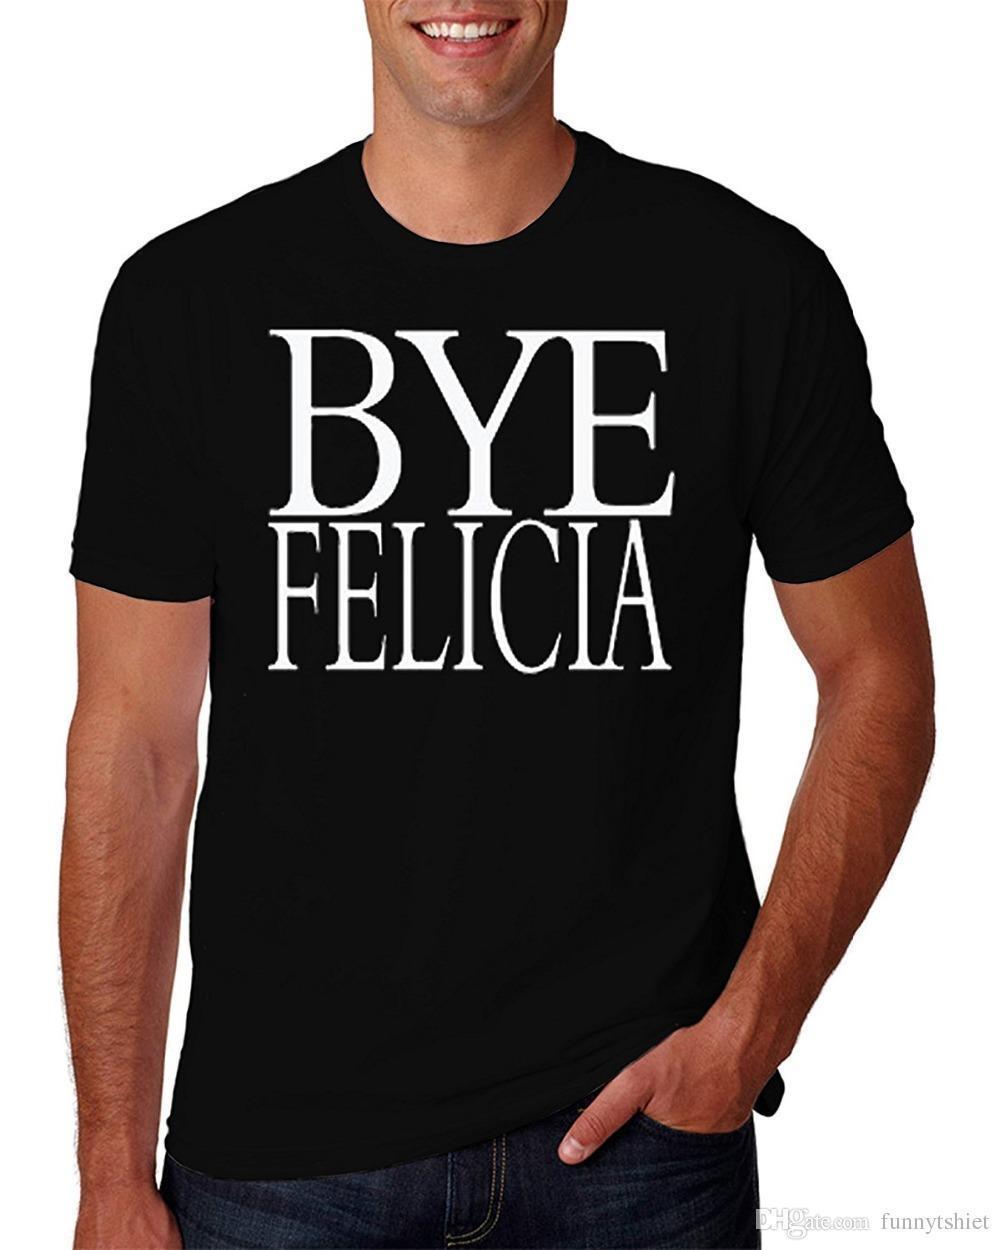 1bd8f749a 2017 Streetwear Short Sleeve Tees Summer Sportwear Casual T Shirt Bye  Felicia Funny Novelty Parody T Shirt Urban T Shirts Irish T Shirts From  Amesion29, ...